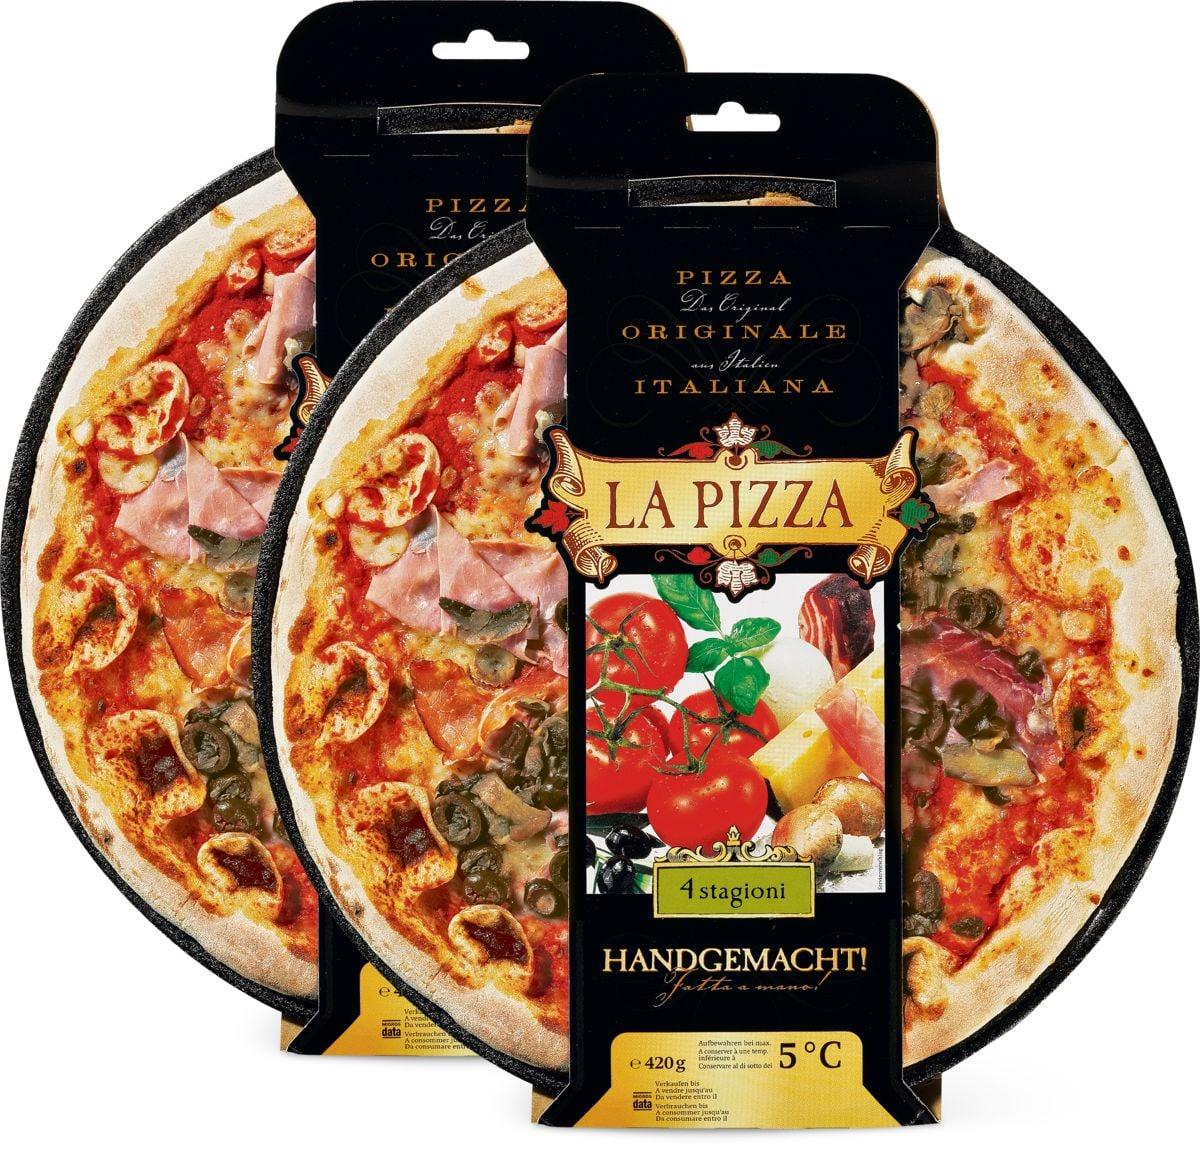 La Pizza im Duo-Pack